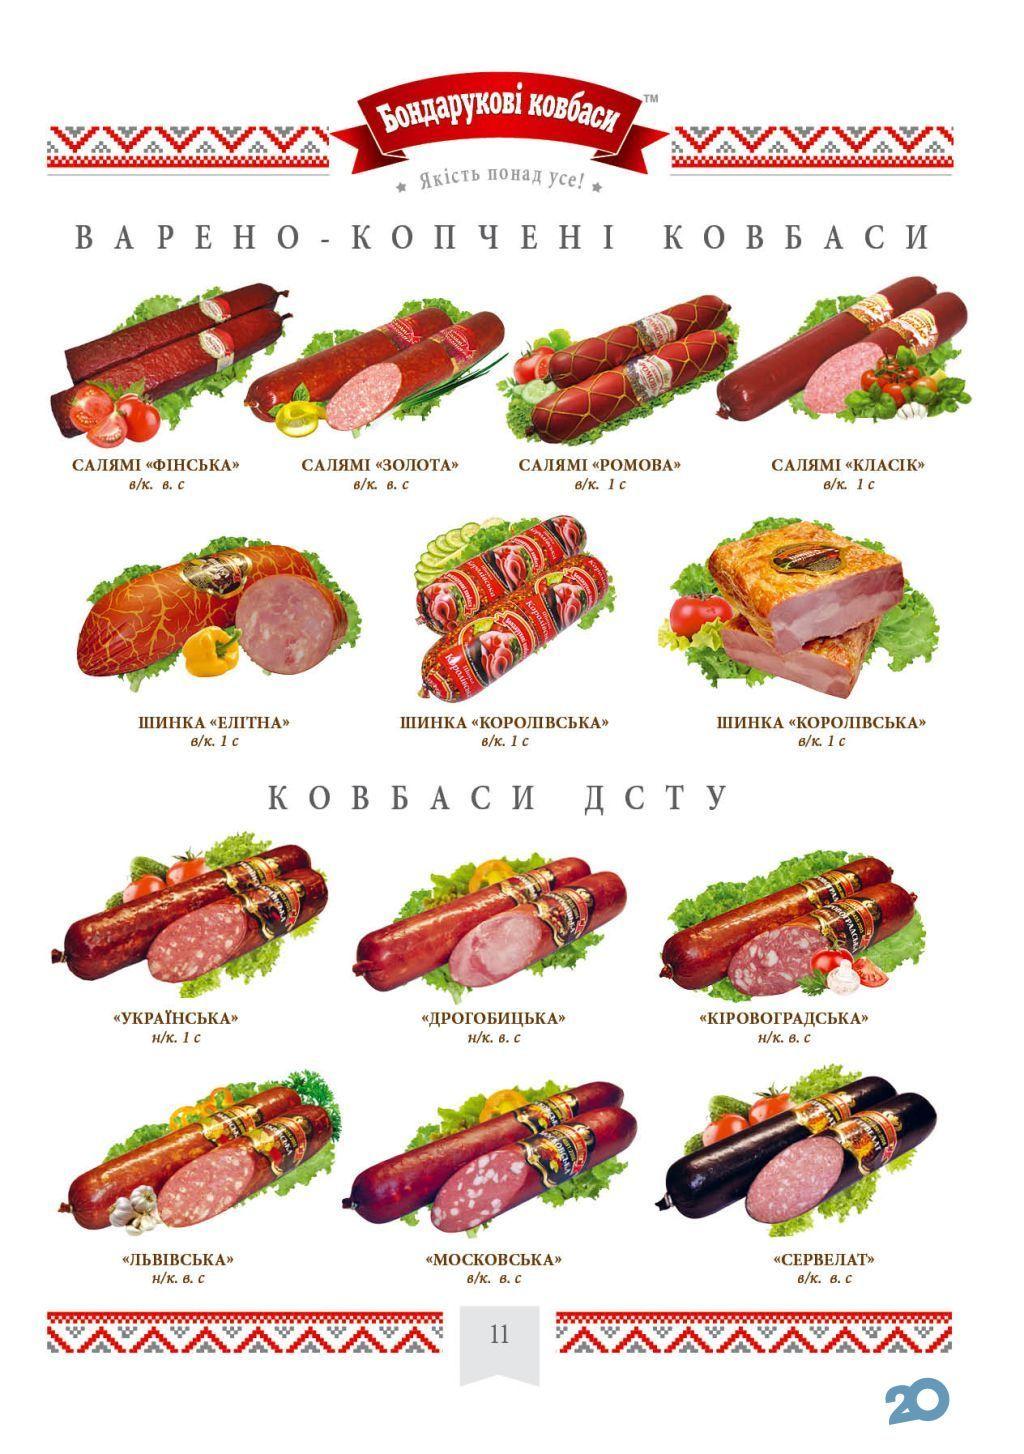 Бондарукові ковбаси, м'ясний магазин - фото 13